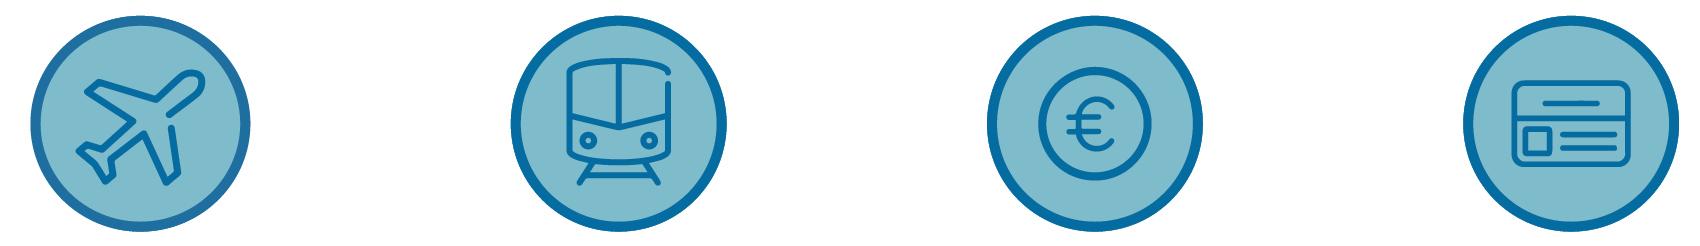 lyon-guide-icons.jpg